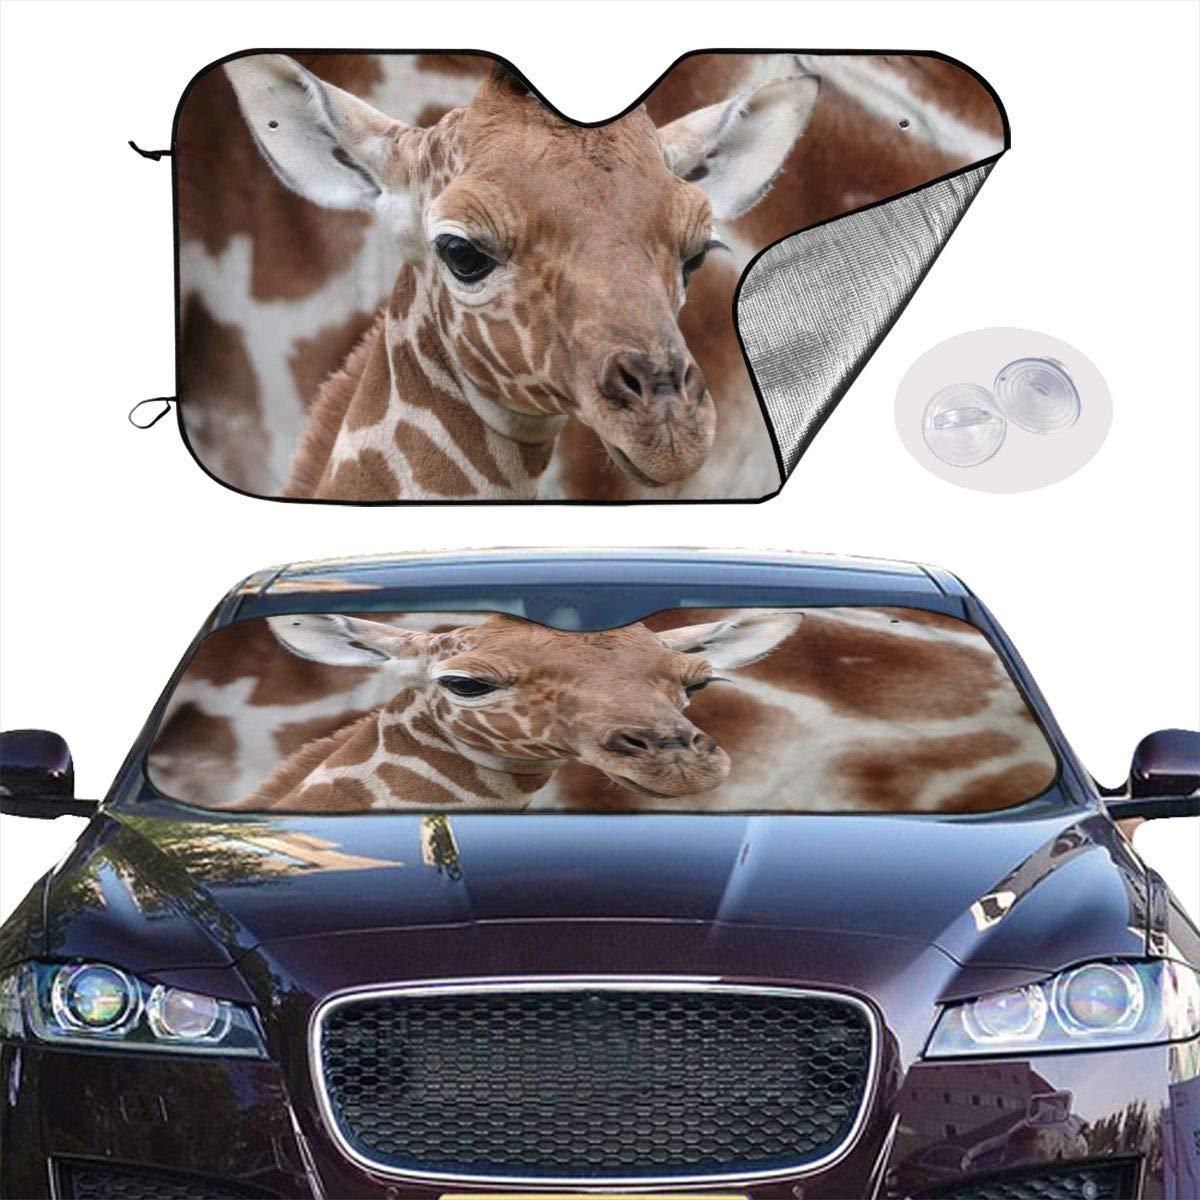 51.2 X 27.5 NengBuy Front Car Sunshade Windshield Baby Giraffe Sunshades for Car Foldable UV Ray Reflector Auto Front Window Sun Shade Visor Shield Cover Keeps Vehicle Cool